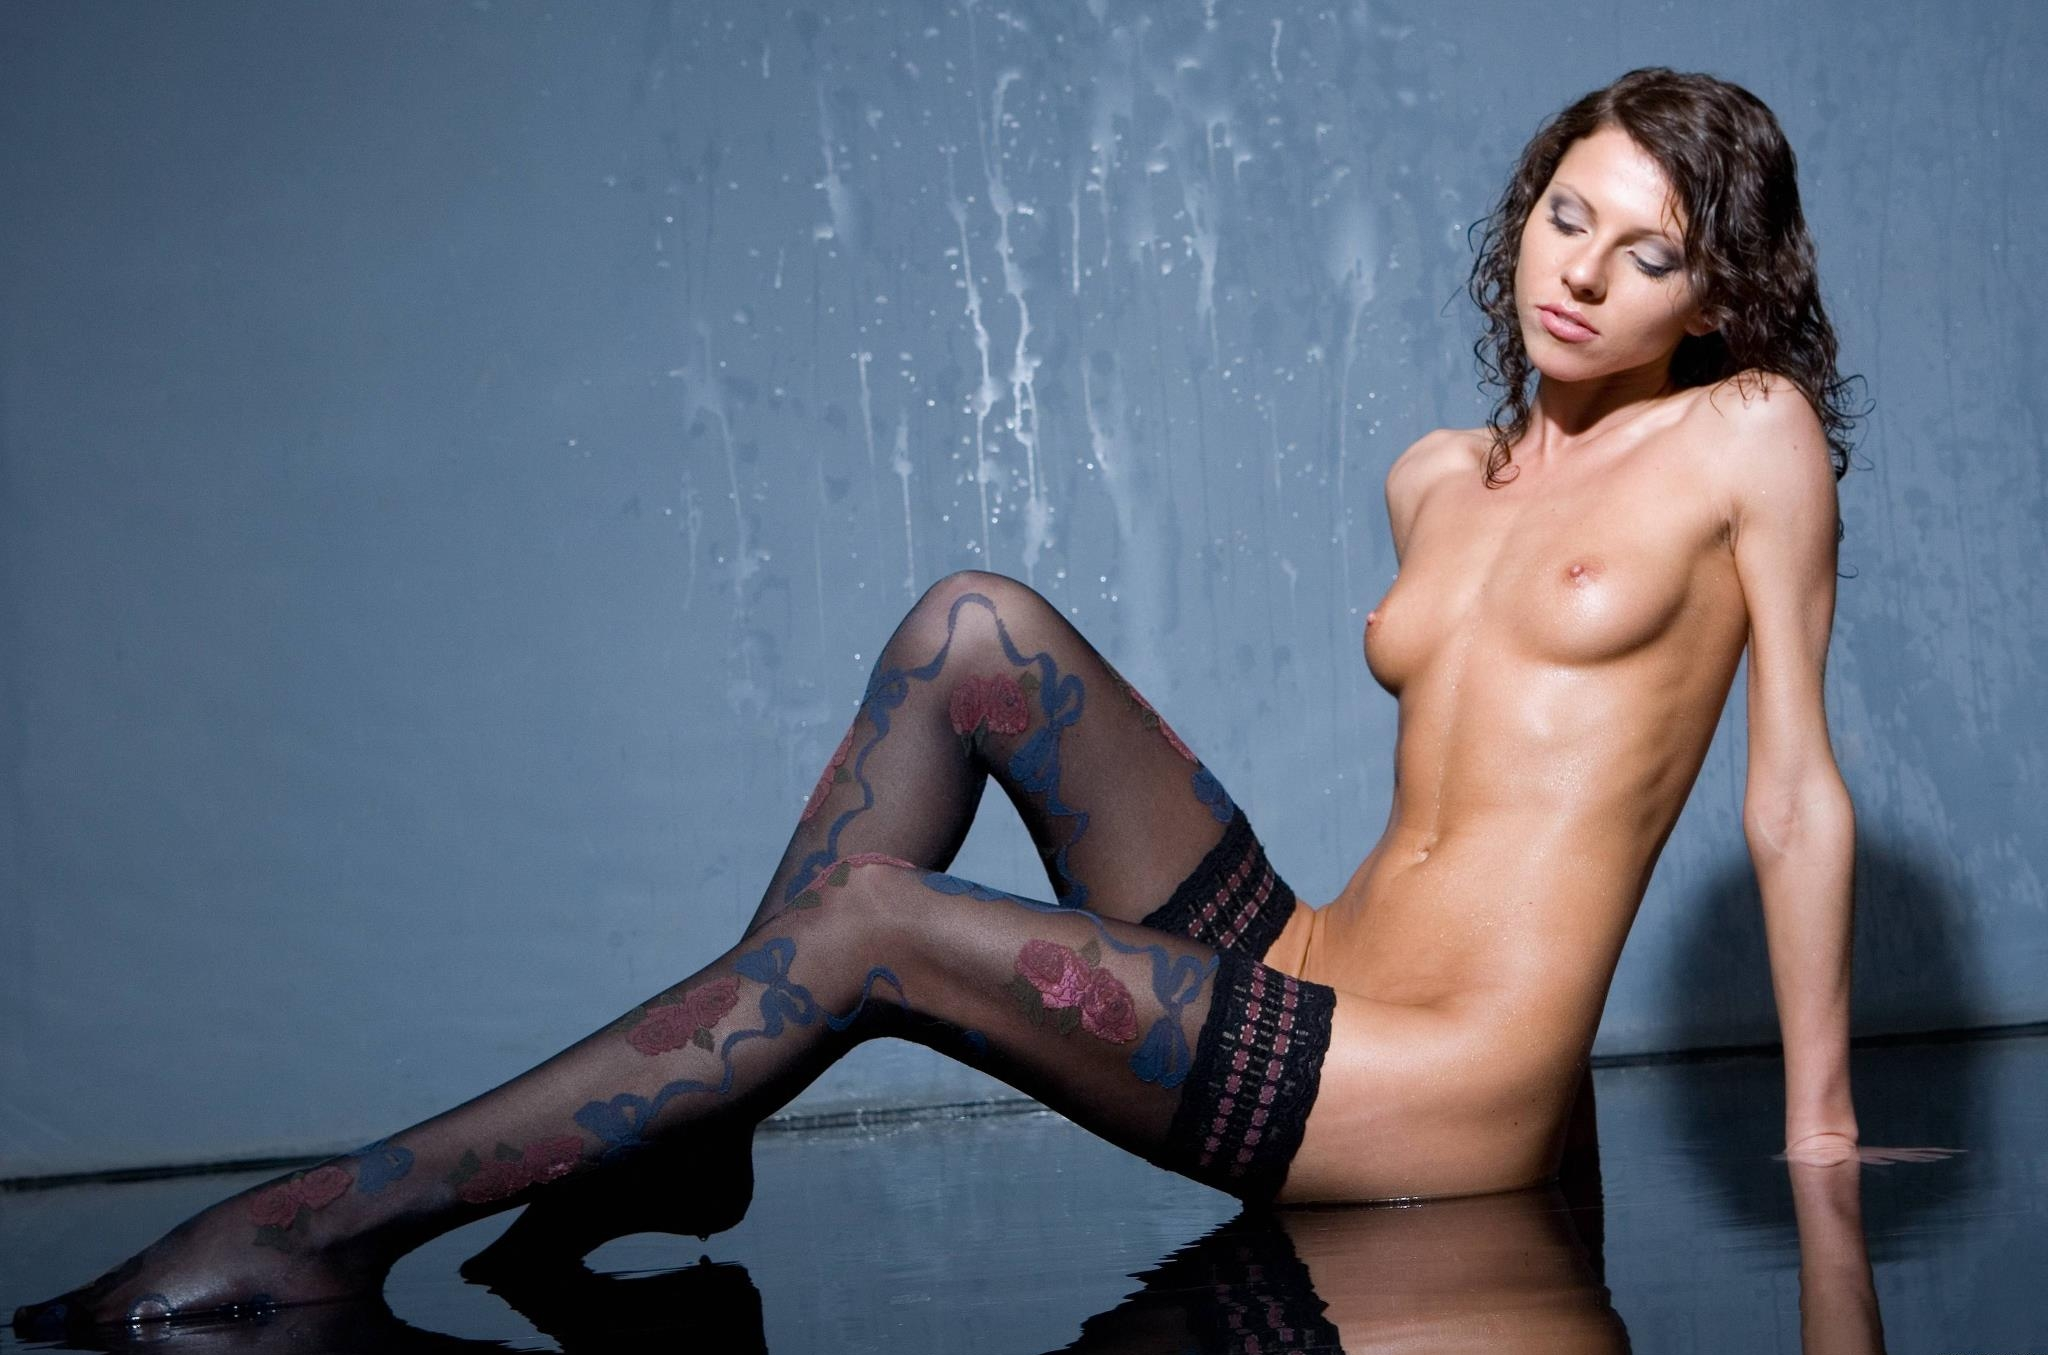 brunette naked young girl in wet black pattern stockings